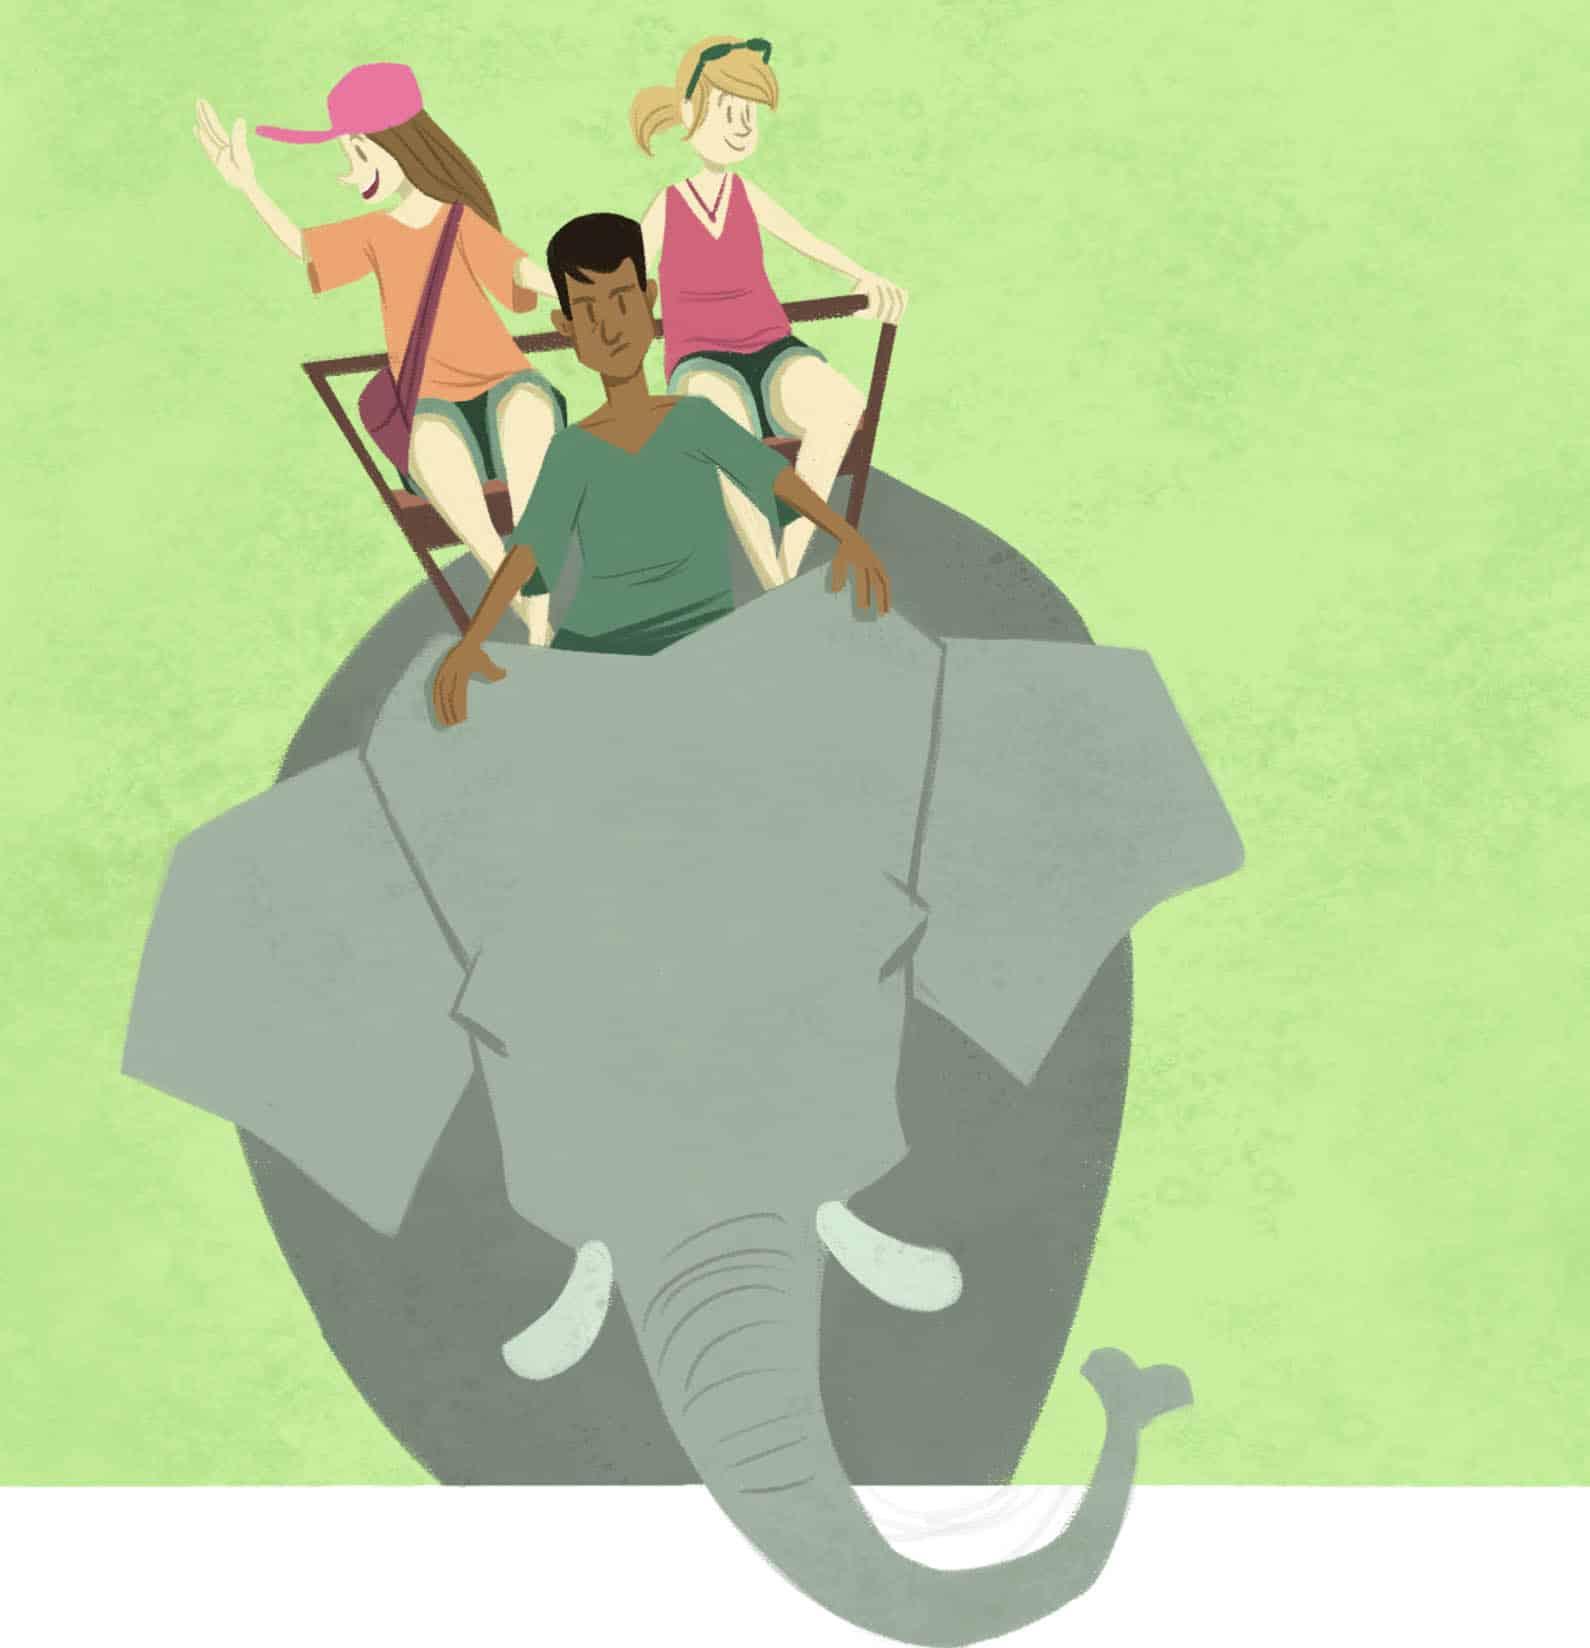 elephant-tourism-hurts-animals-and-indigenous-cultures-the-daily-titan Elephant tourism hurts animals and indigenous cultures - The Daily Titan